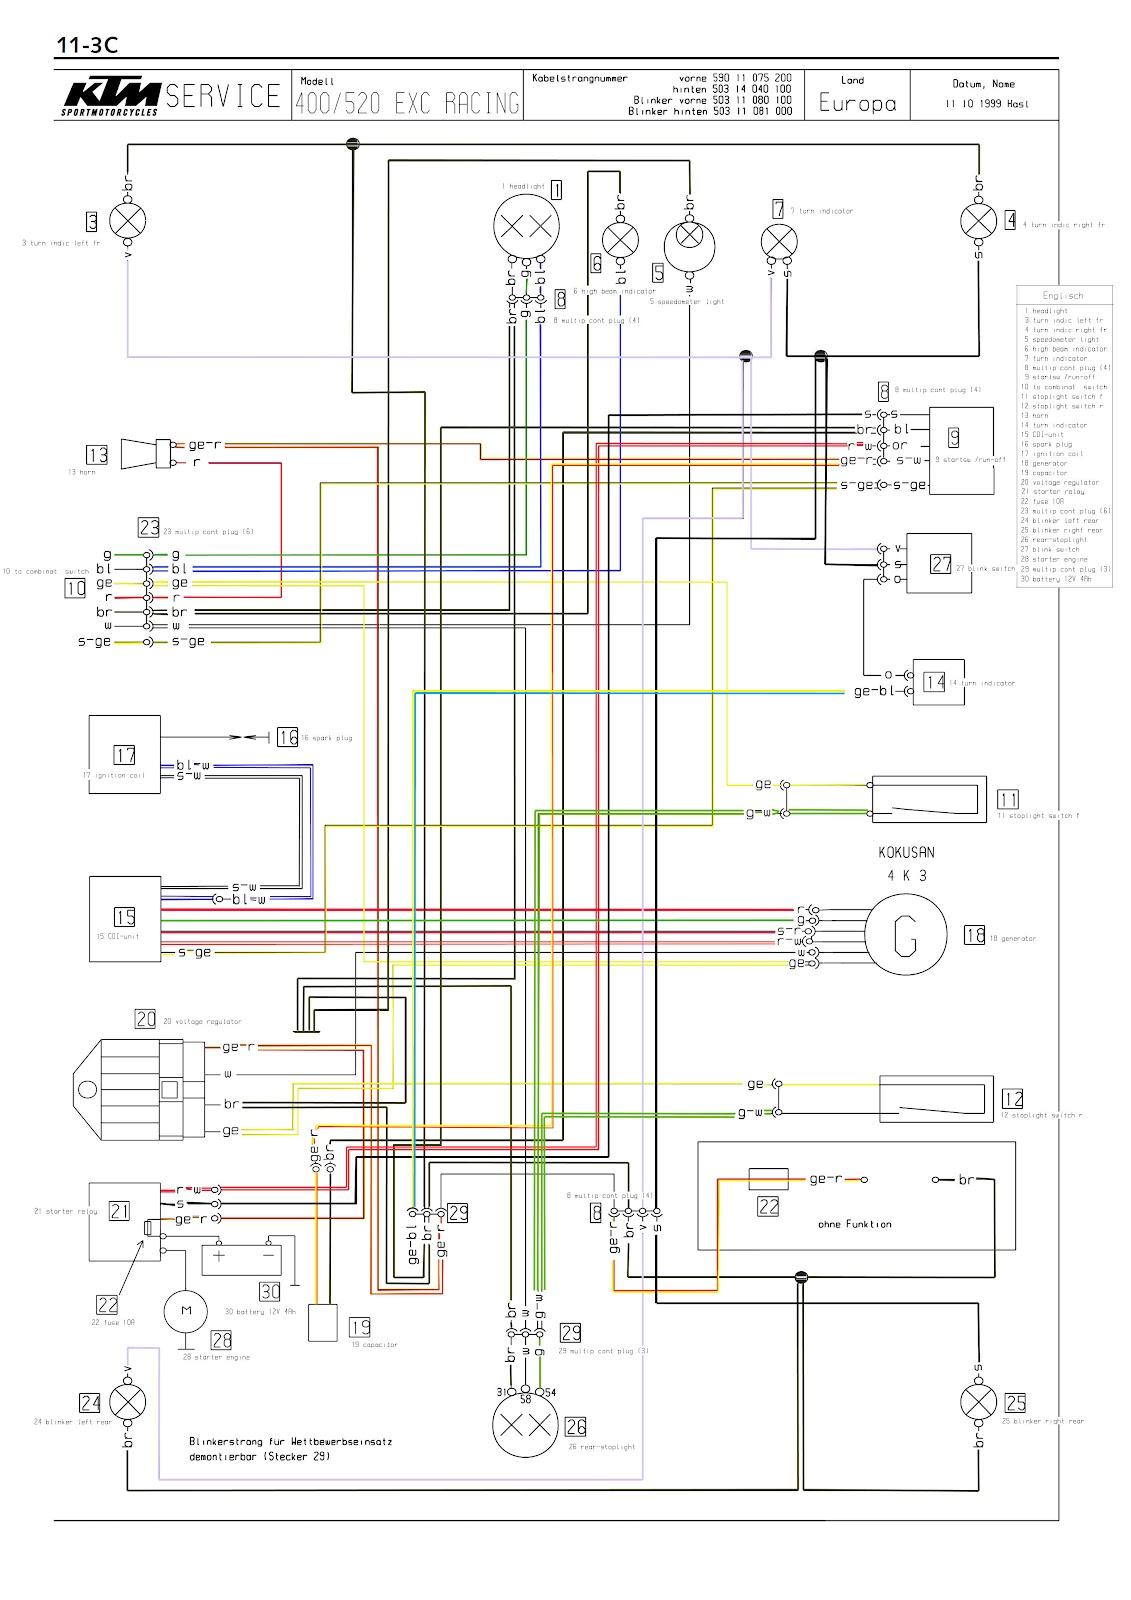 ktm 400 wiring diagram wiring library 2001 ktm 400 exc wiring diagram ktm 400 wiring diagram [ 1131 x 1600 Pixel ]